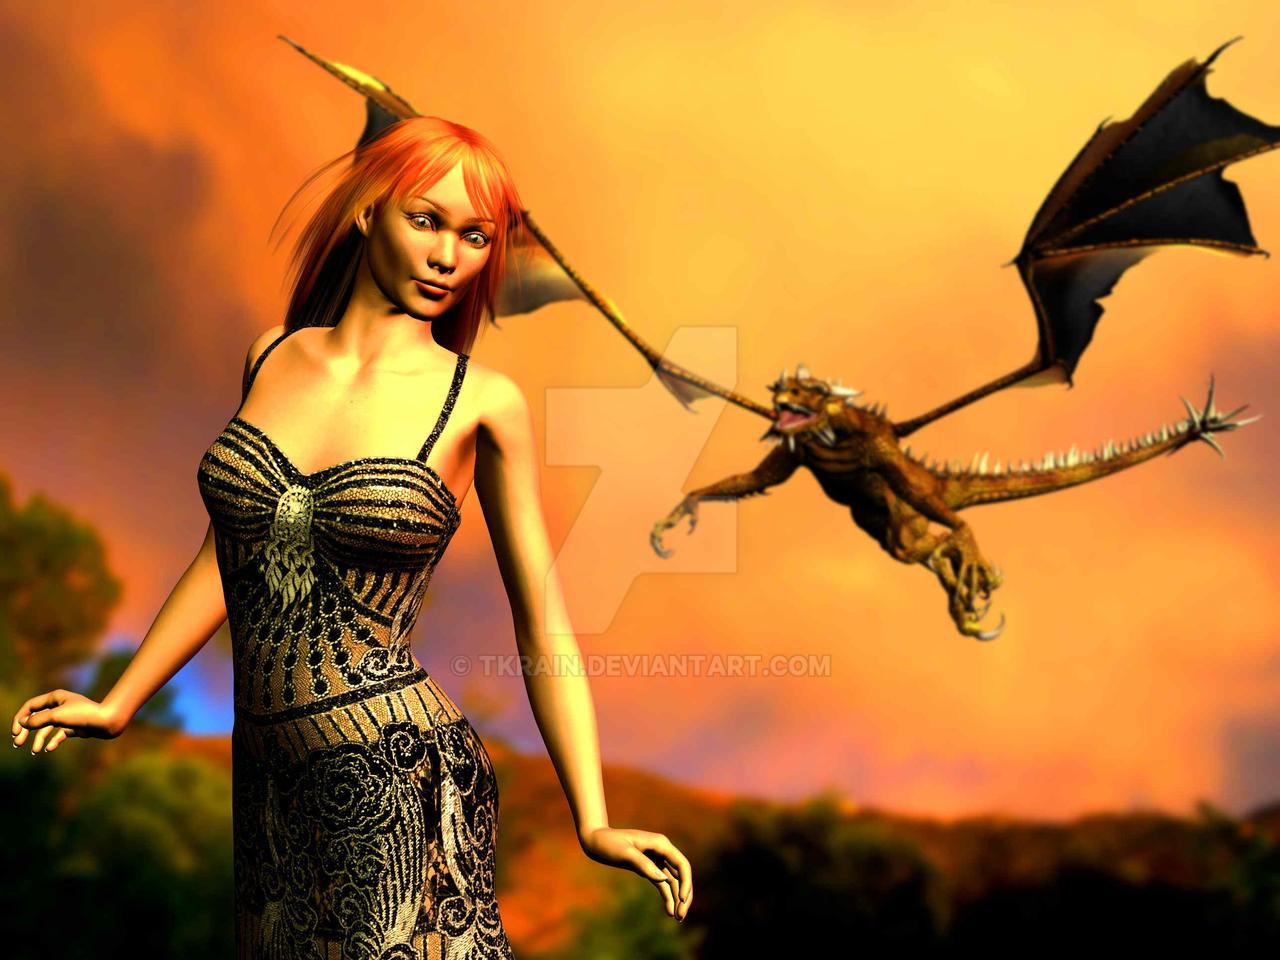 The Dragon's Consort by Tkrain